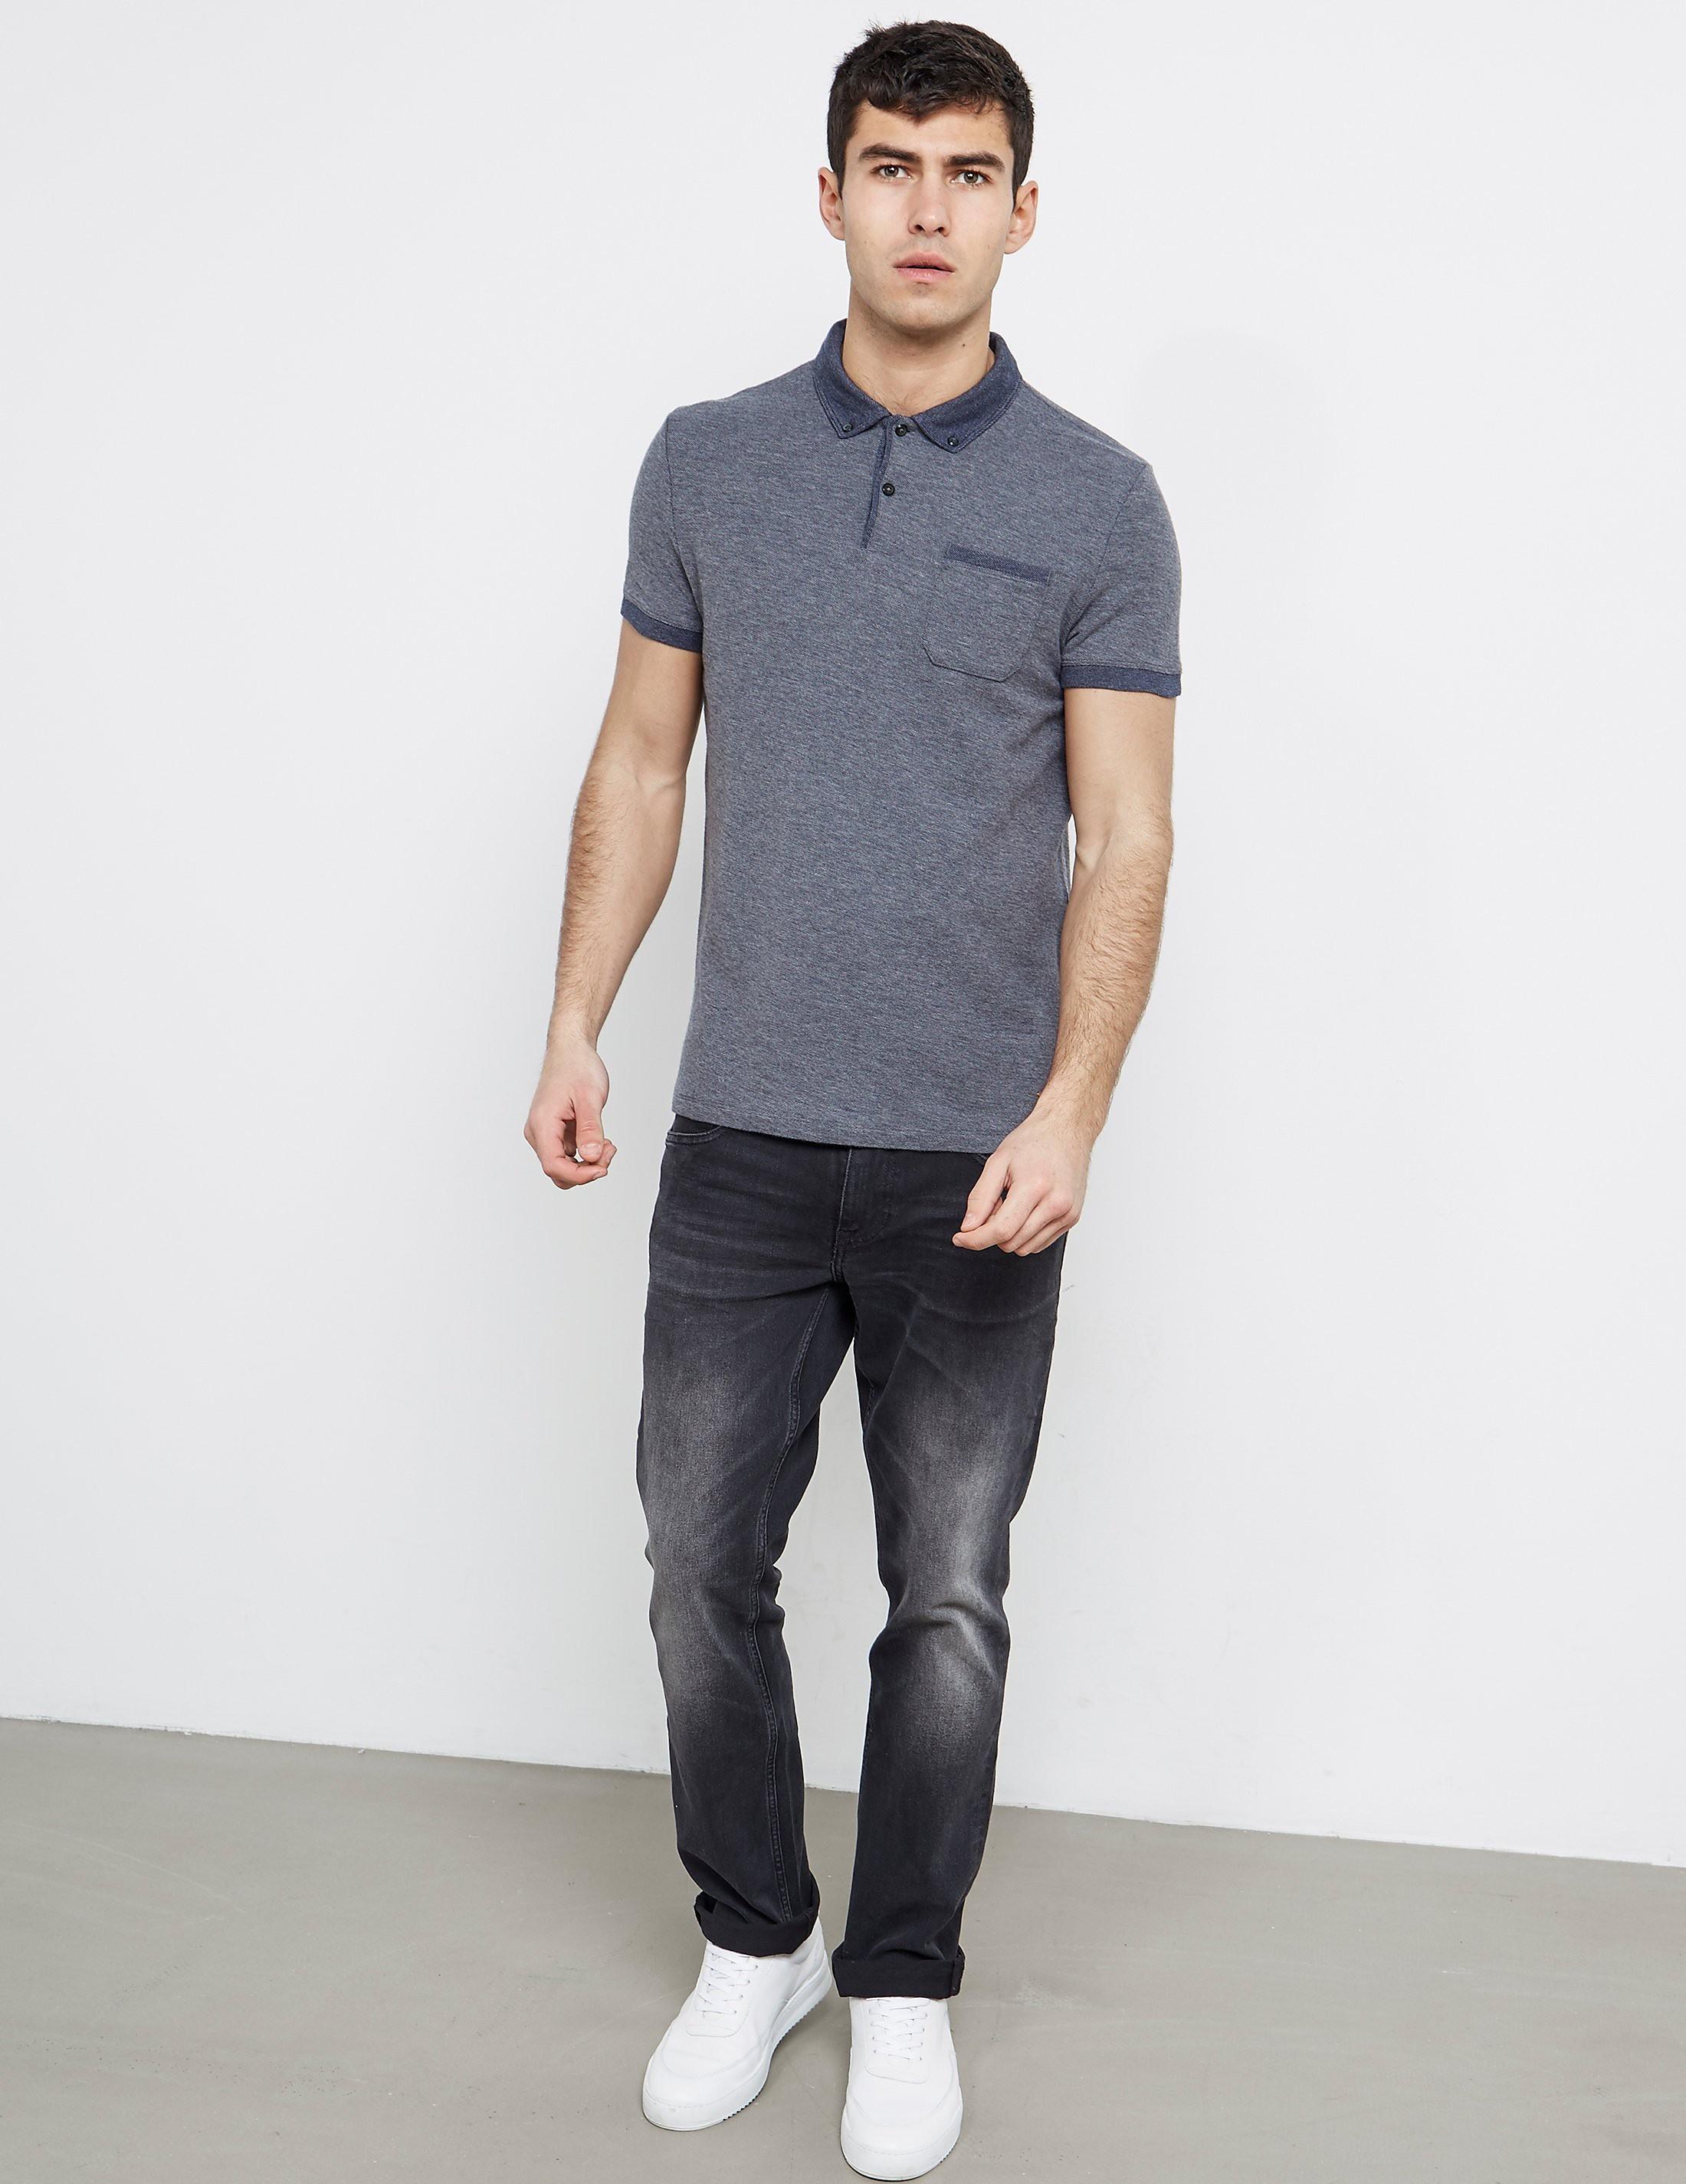 BOSS Orange Short Sleeve Pocket Polo Shirt